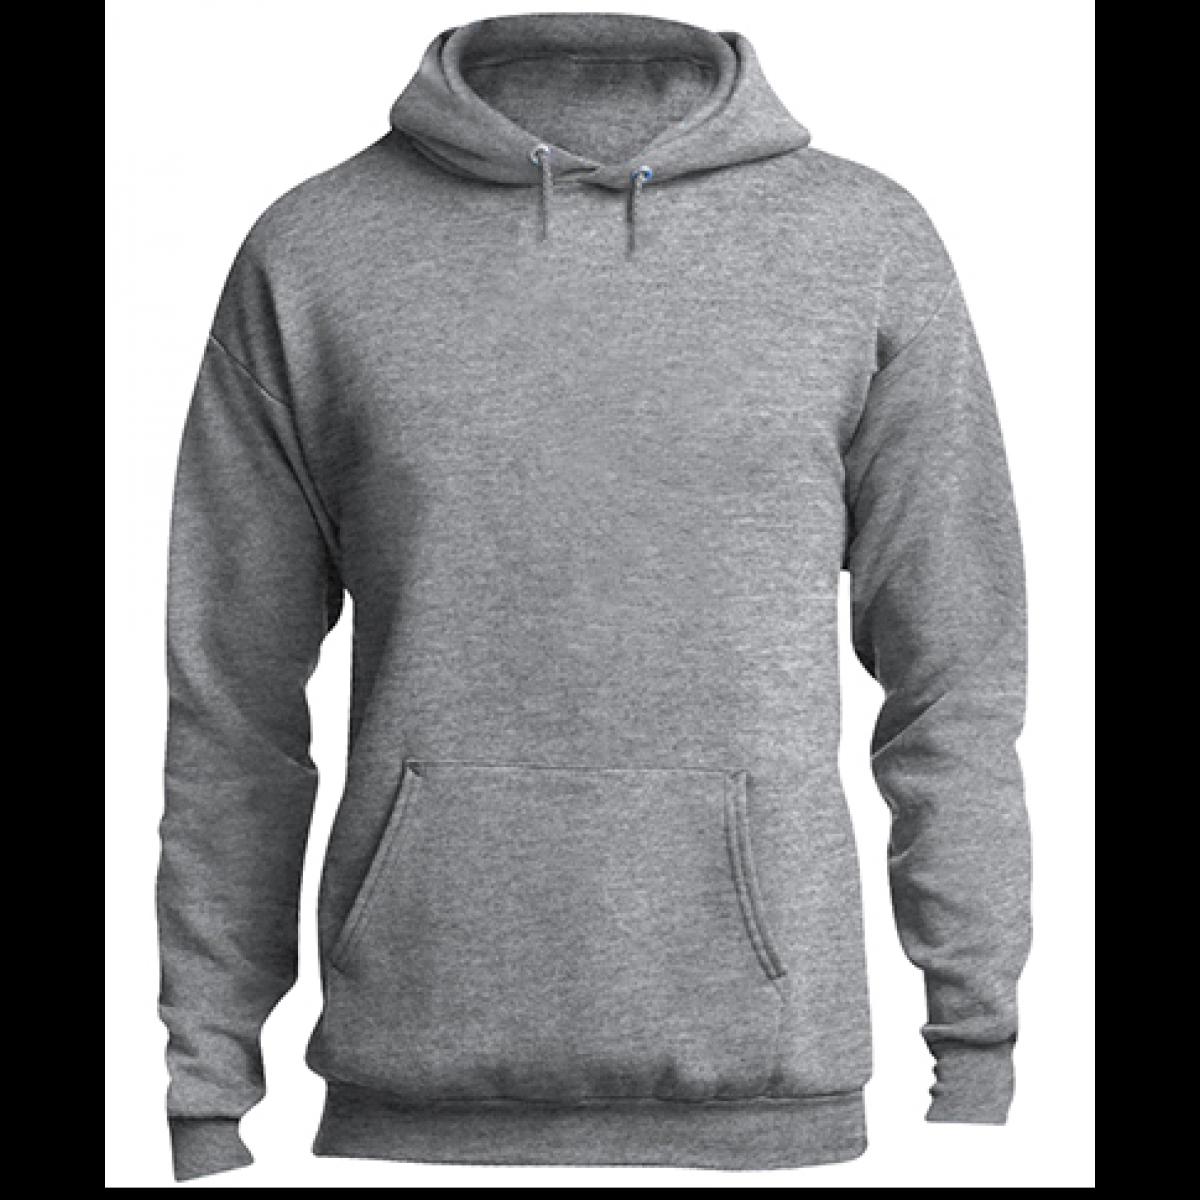 Classic Pullover Hooded Sweatshirt